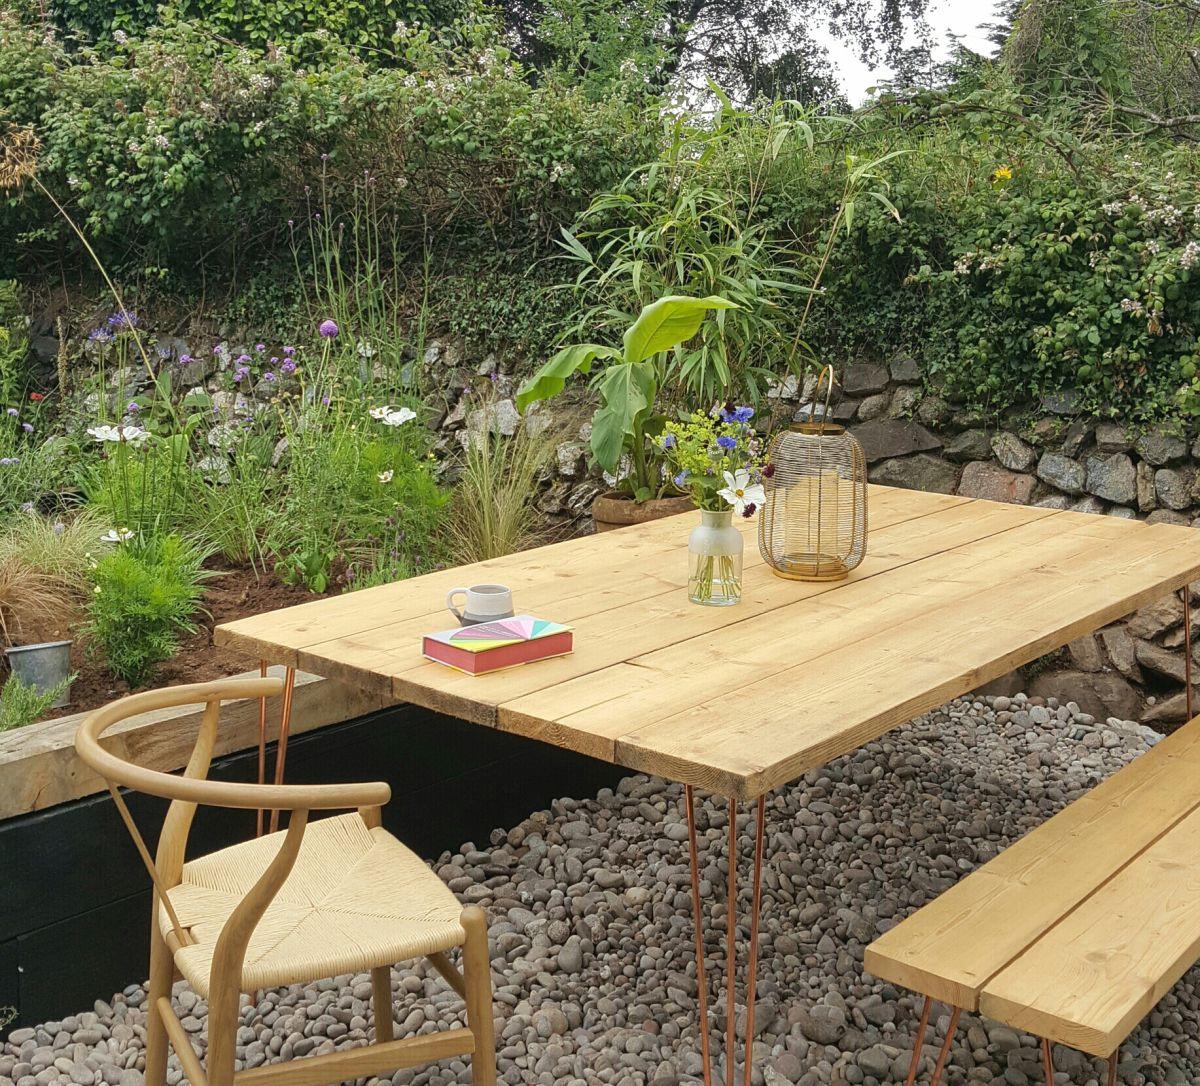 My Beautiful Copper Hairpin Garden Table Alice In Scandiland Garden Table Backyard Table Wooden Outdoor Table